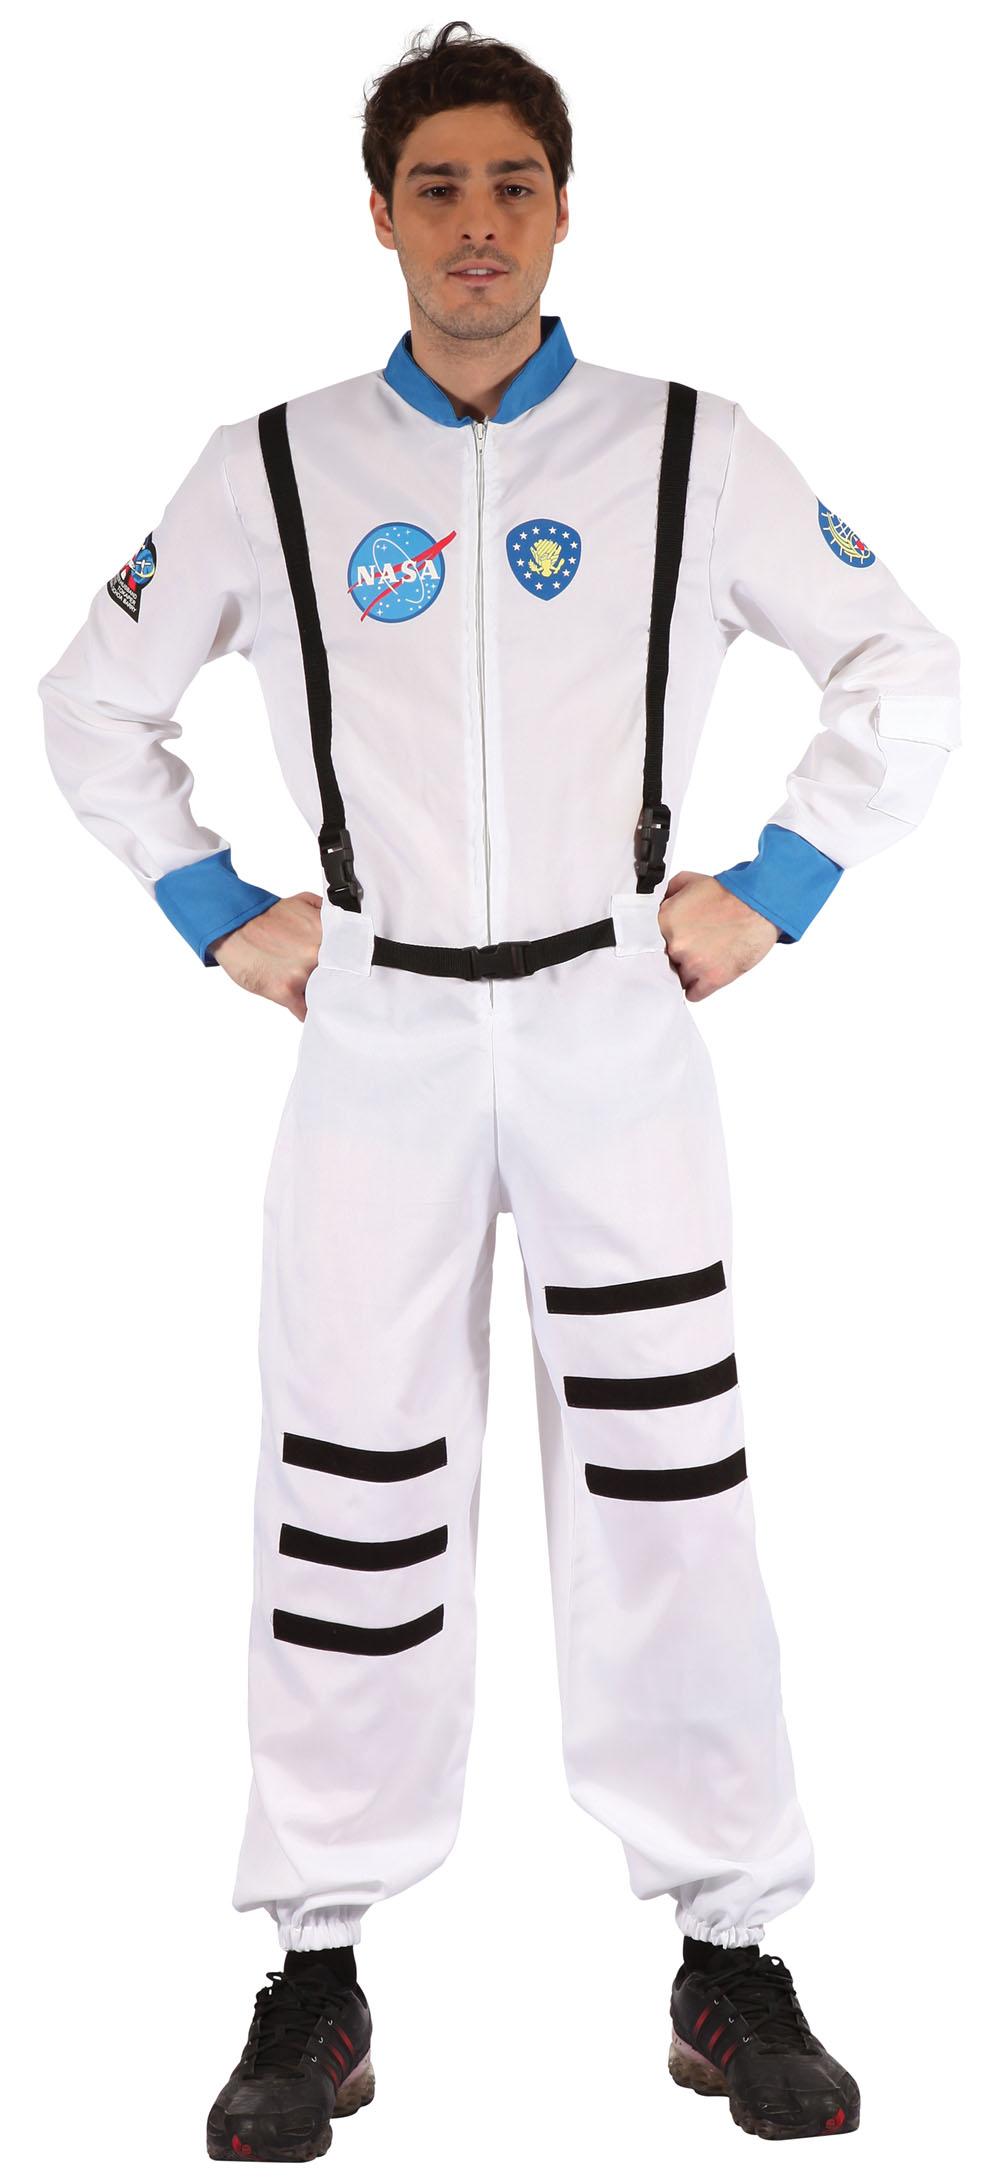 Boys Astronaut Spaceman Spacesuit Fancy Dress Costume NASA Kids Outfit